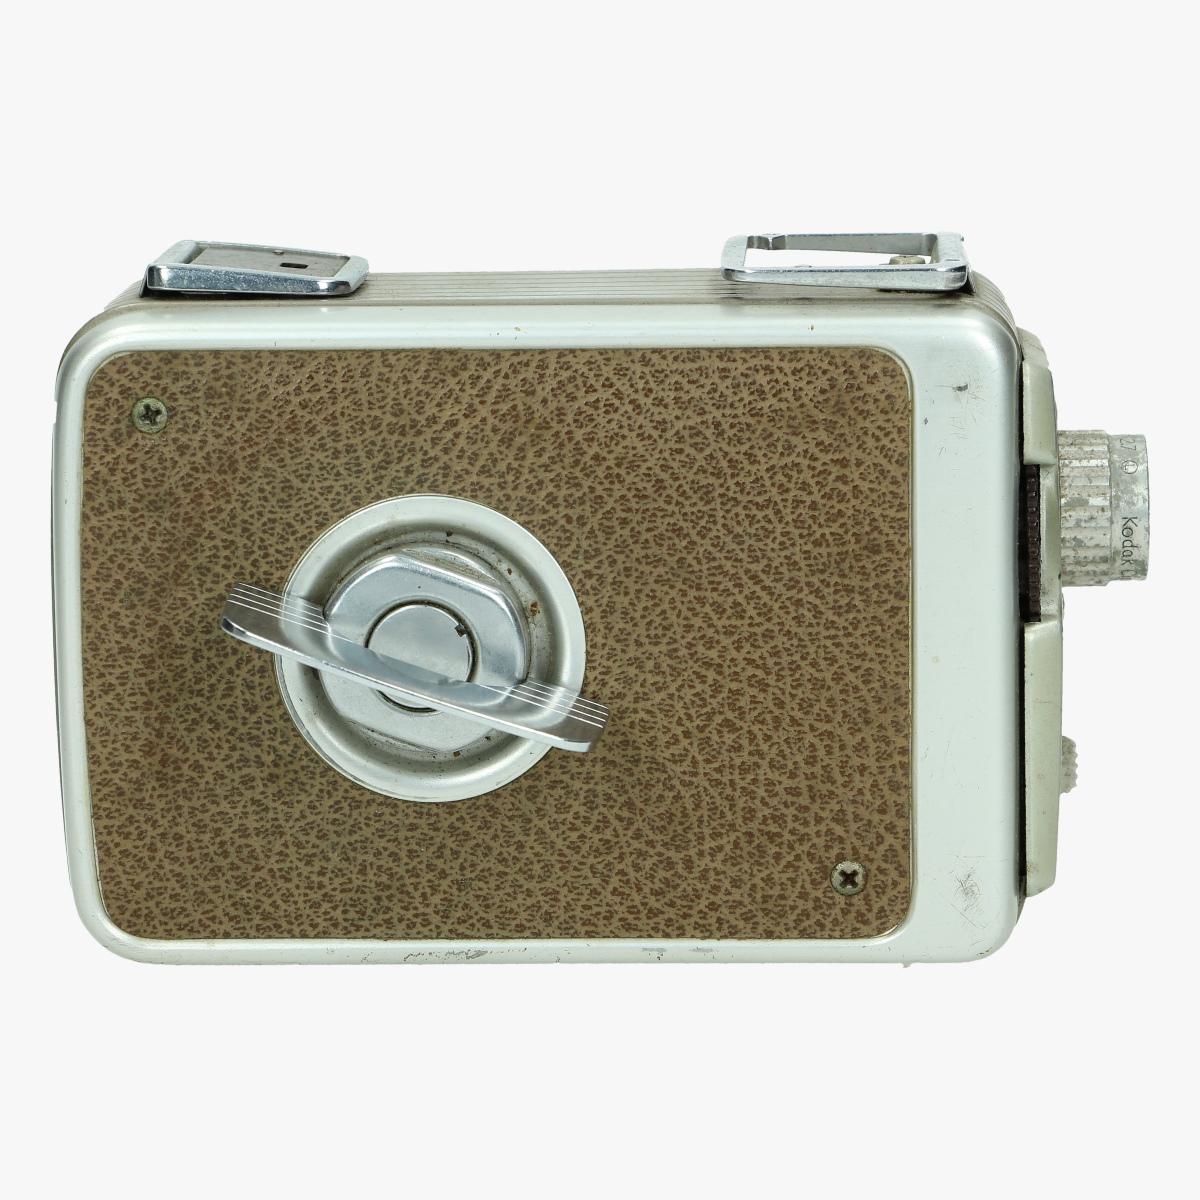 Afbeeldingen van videocamera brownie movie camera eight mm